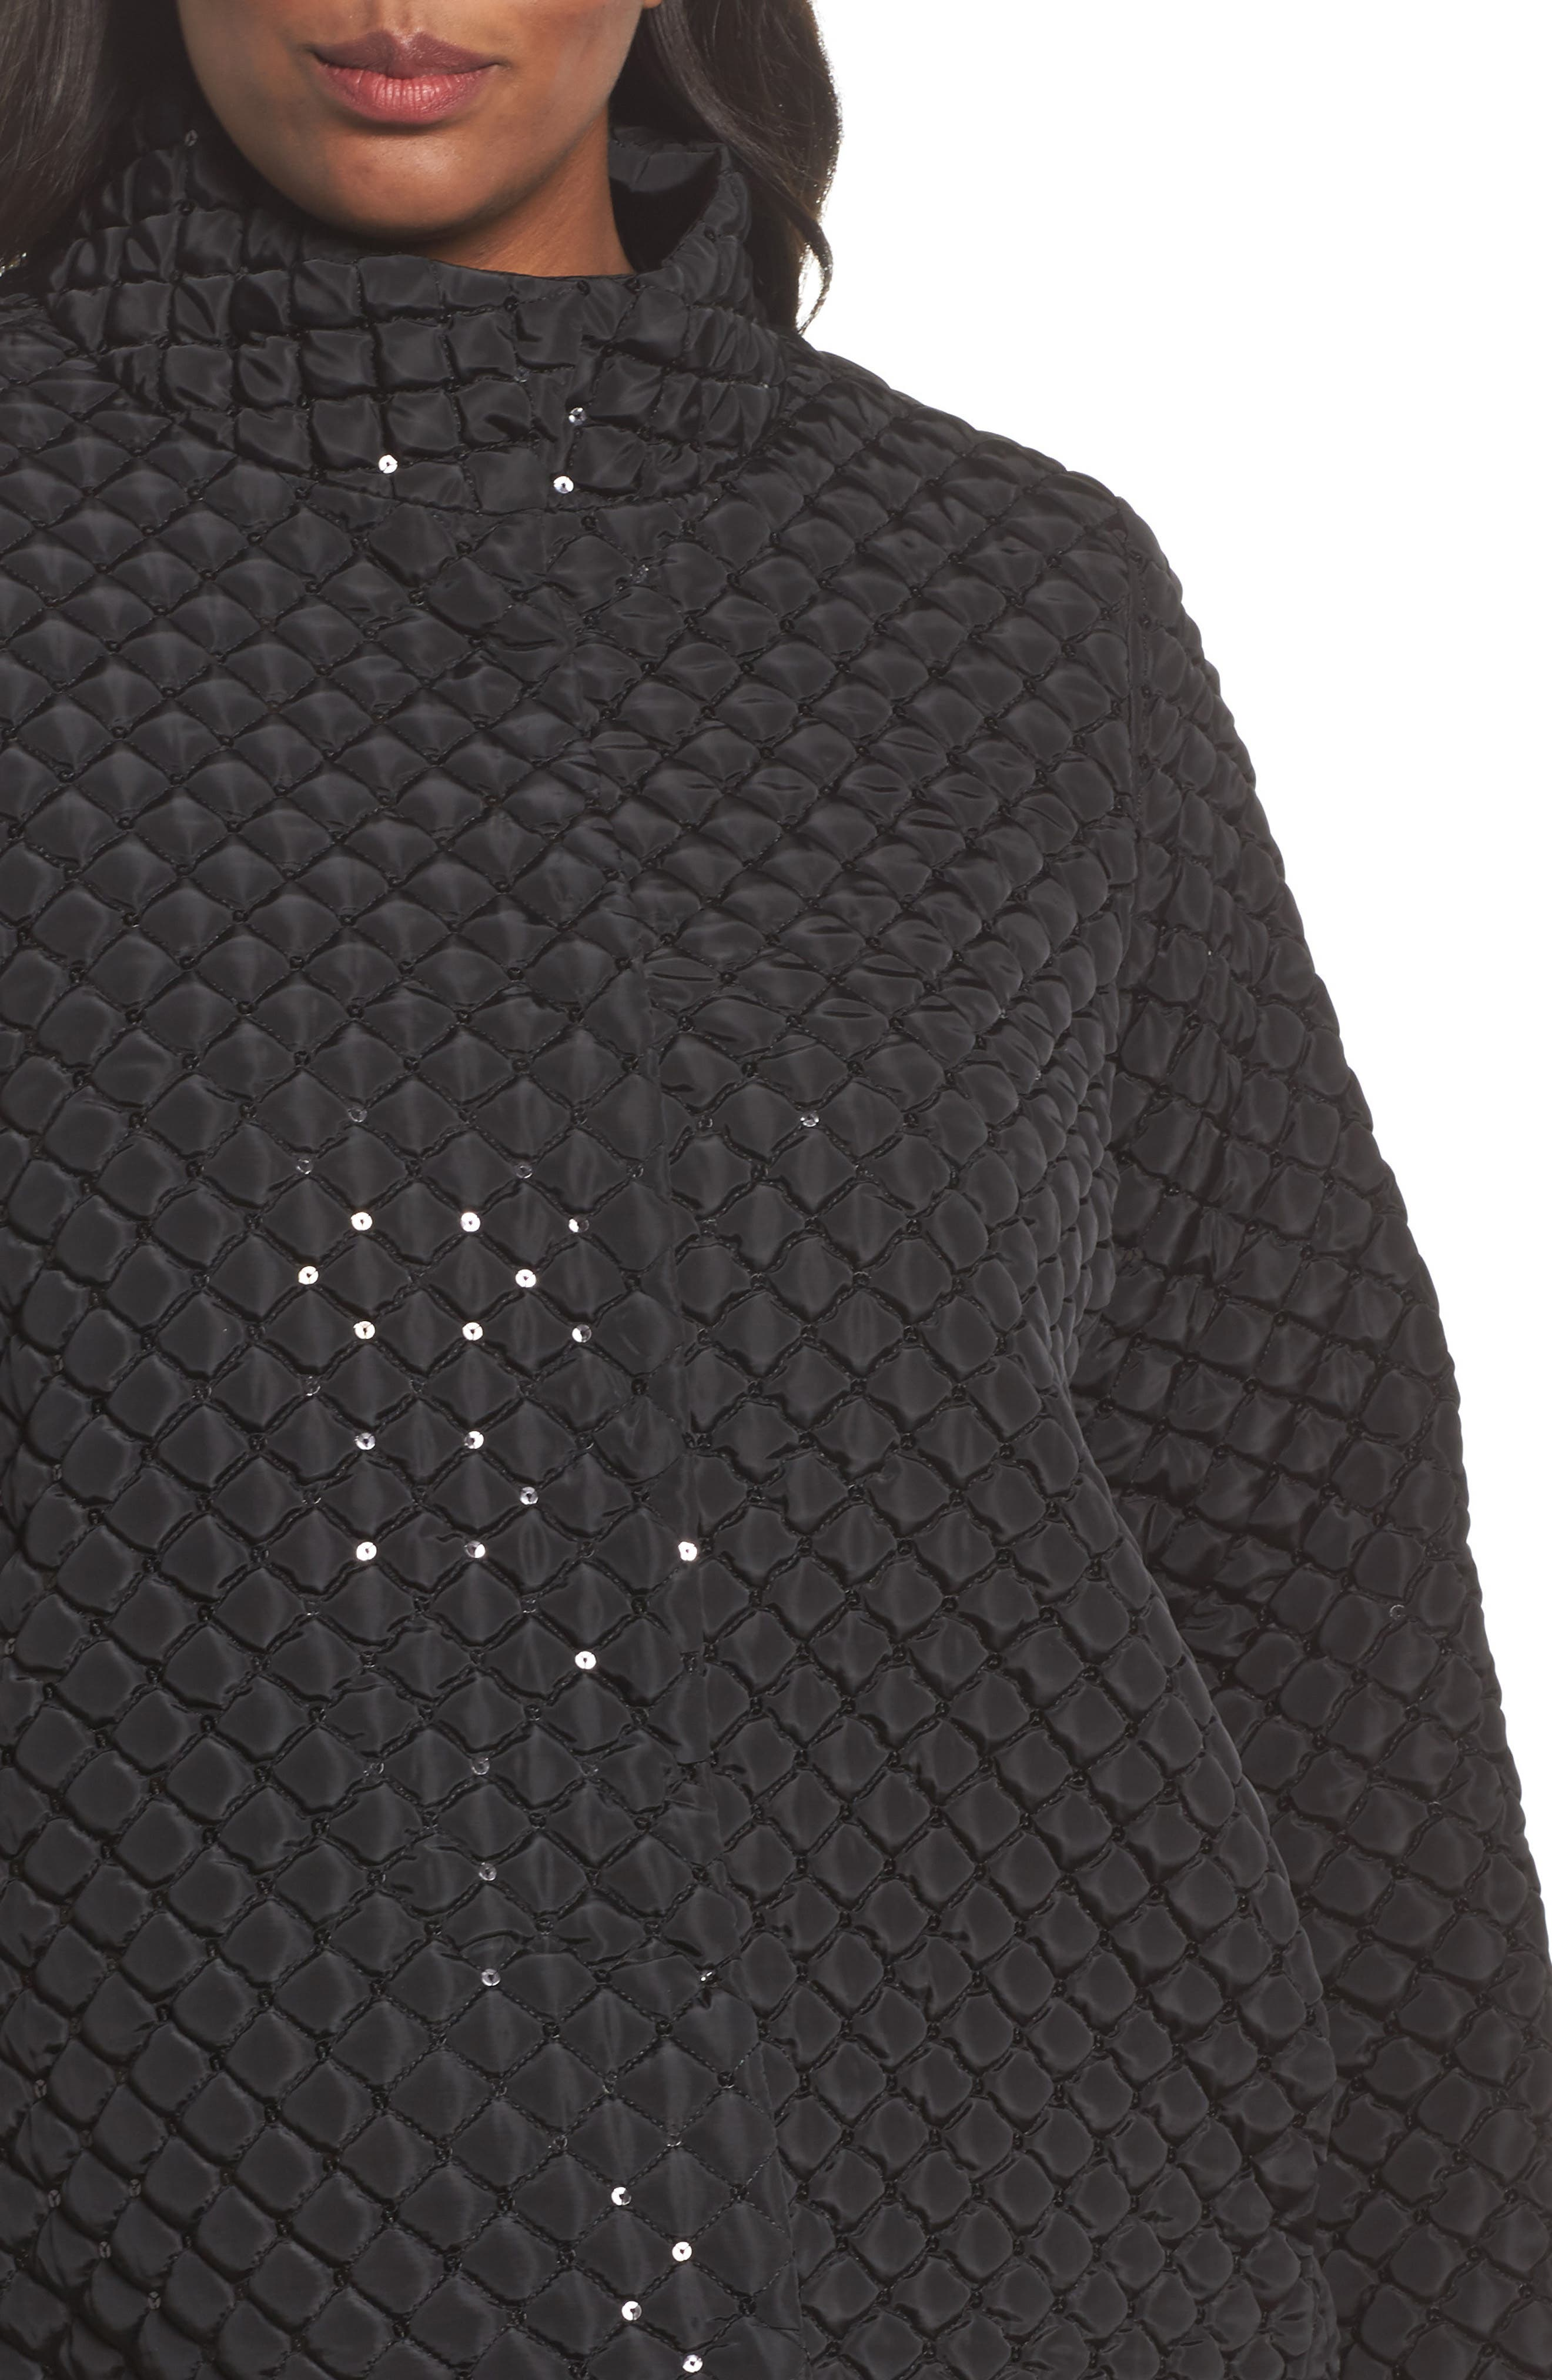 Papaia Sequin Jacket,                             Alternate thumbnail 4, color,                             001